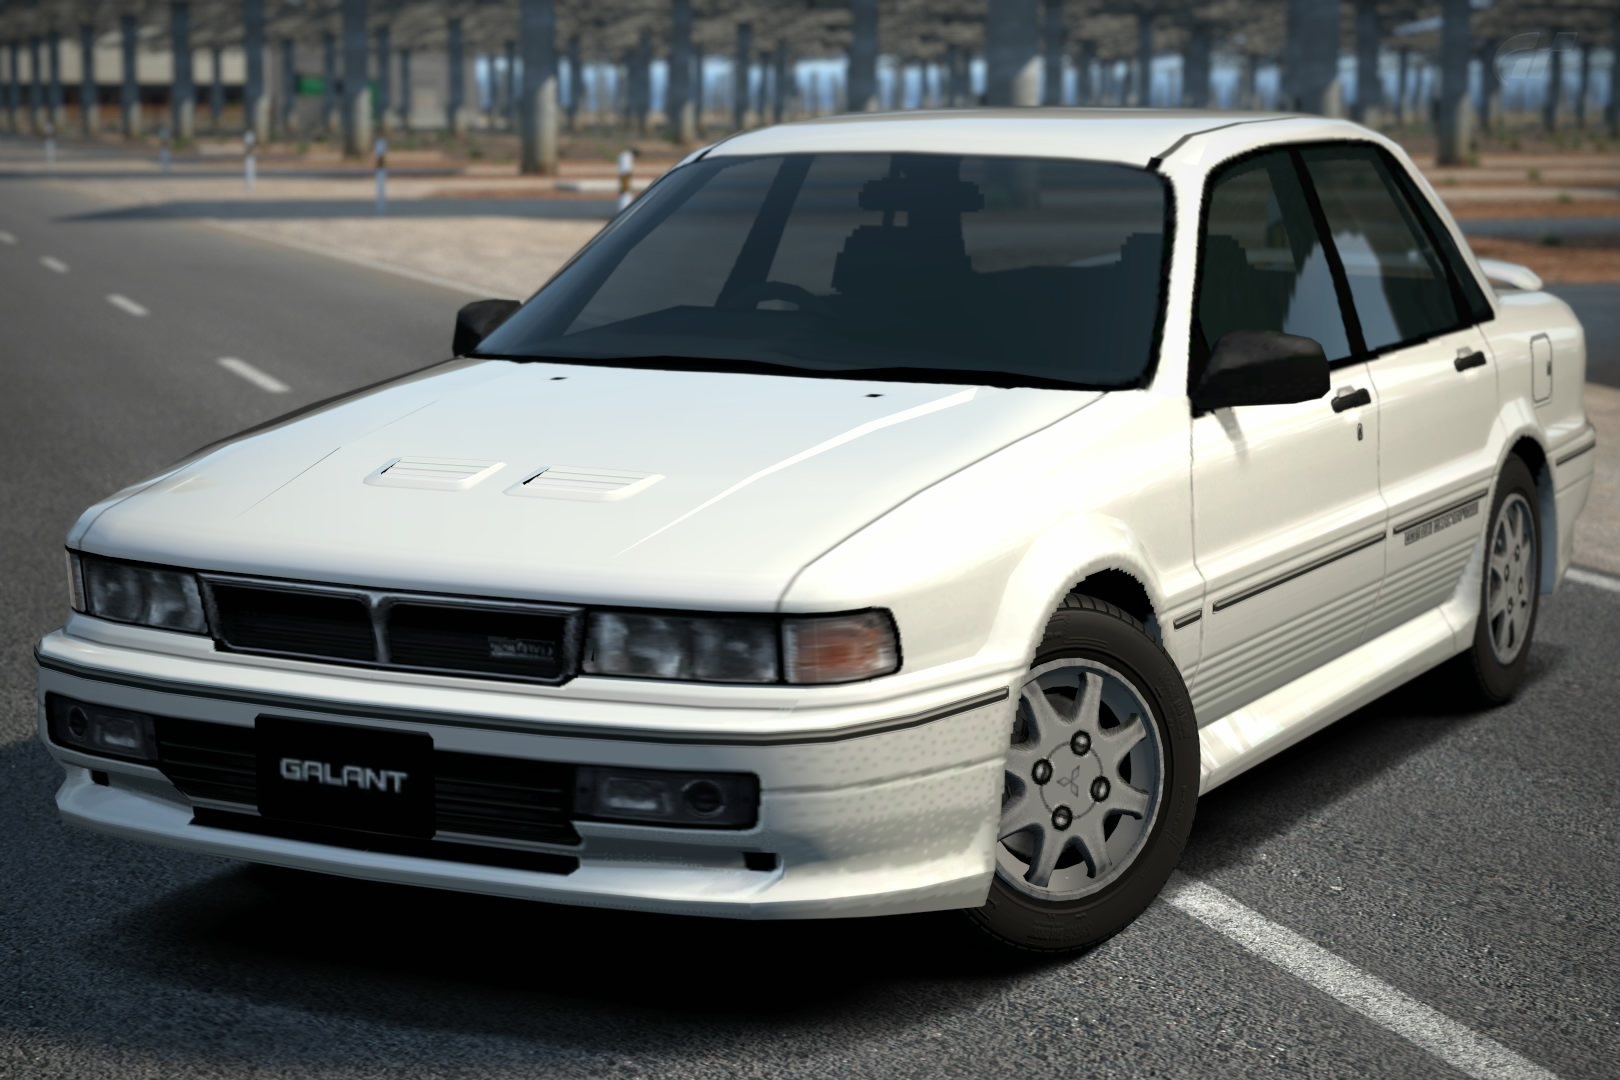 Mitsubishi Galant 2 0 Dohc Turbo Vr 4 89 Gran Turismo